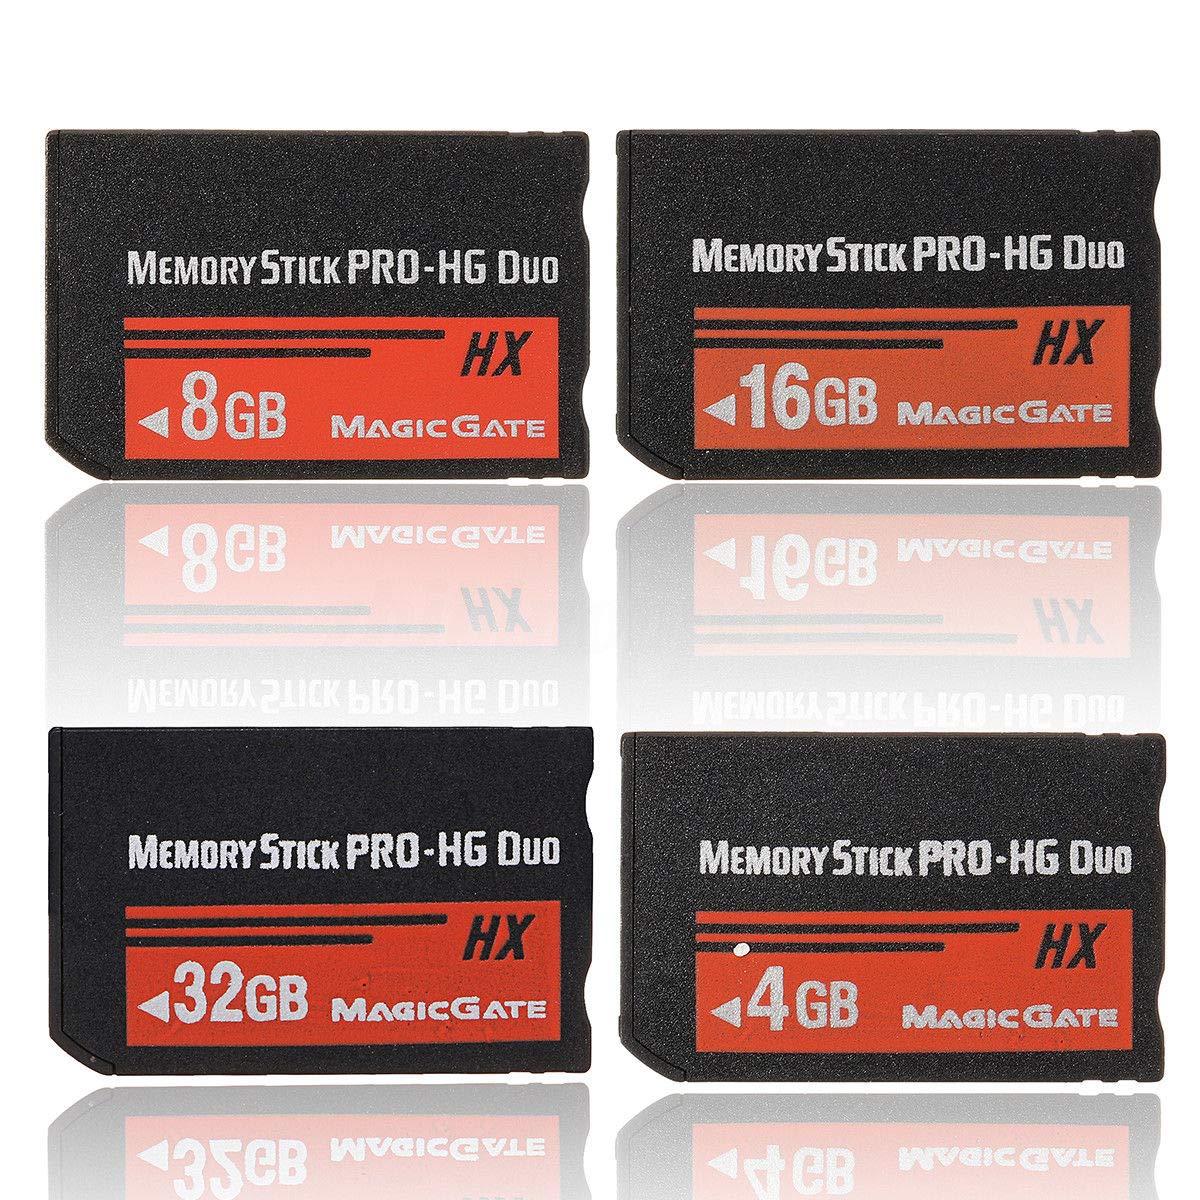 Glossia 32GB Tarjeta de Memoria Ms Pro Duo HX Tarjeta Flash para Cybershot C/ámera